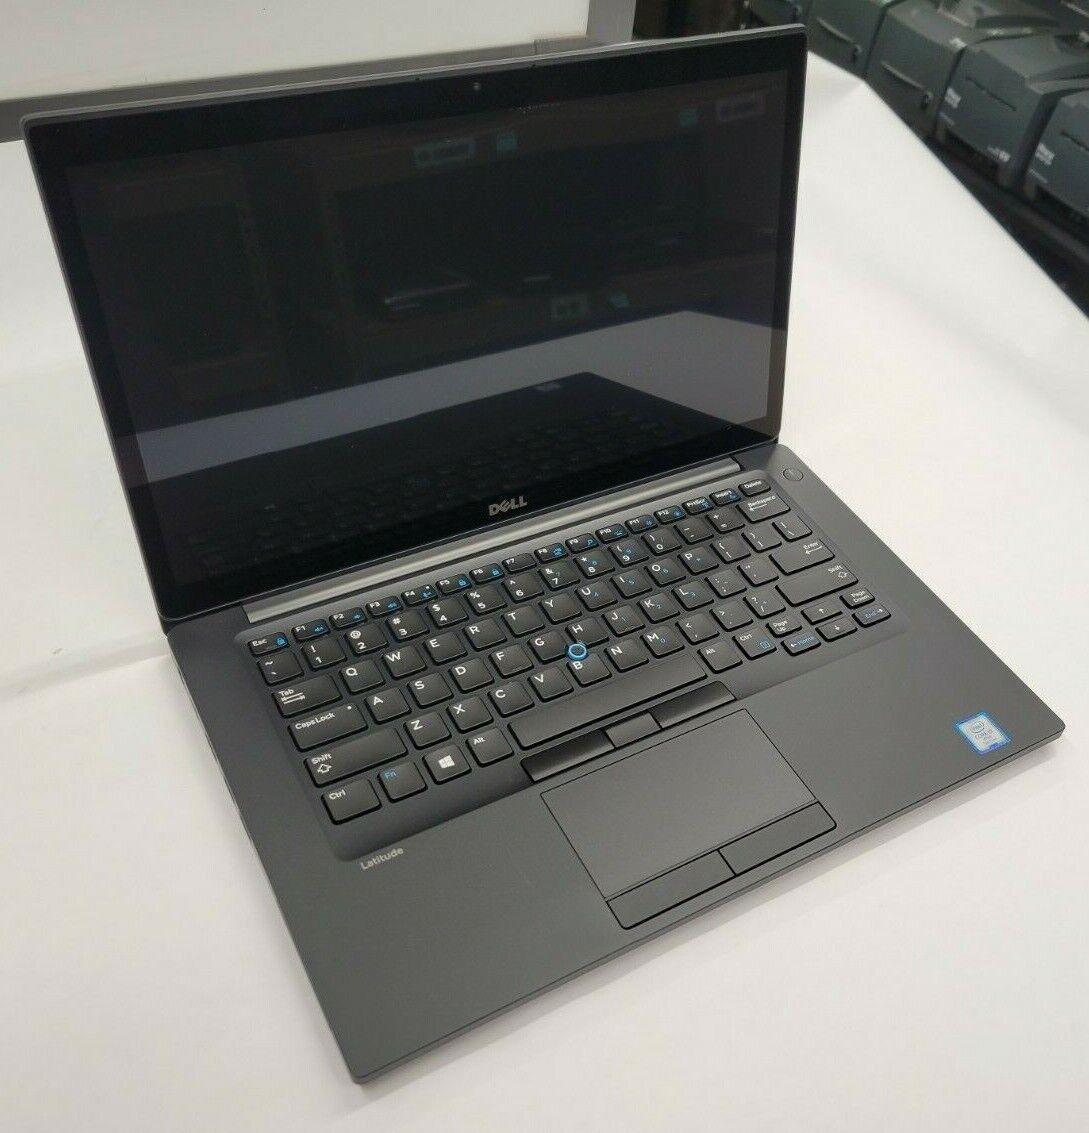 DELL LATITUDE 7480 INTEL i5-7300U 2.6GHz 16GB RAM 512GB SSD WIN 10 LAPTOP [B2]